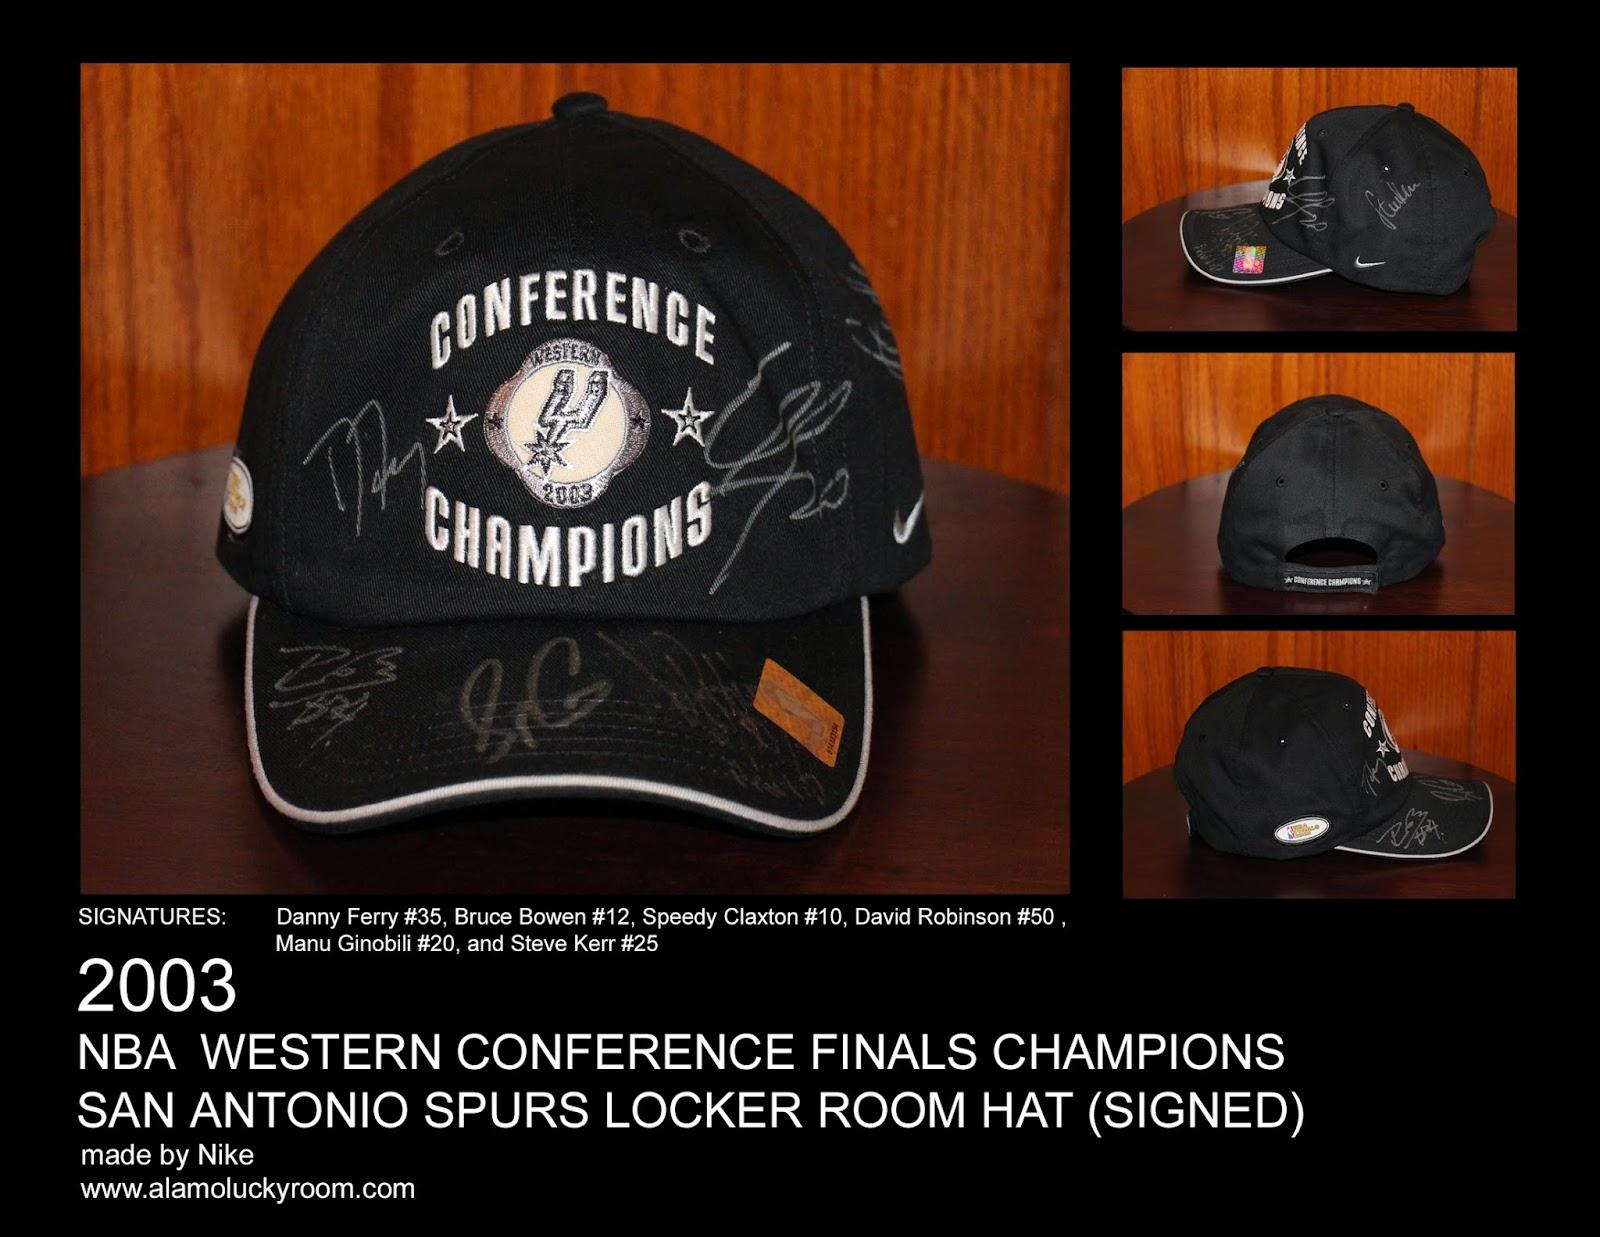 08da045d94b 2003 San Antonio Spurs NBA Western Conference Finals Champions Locker Room  Hat (signed)